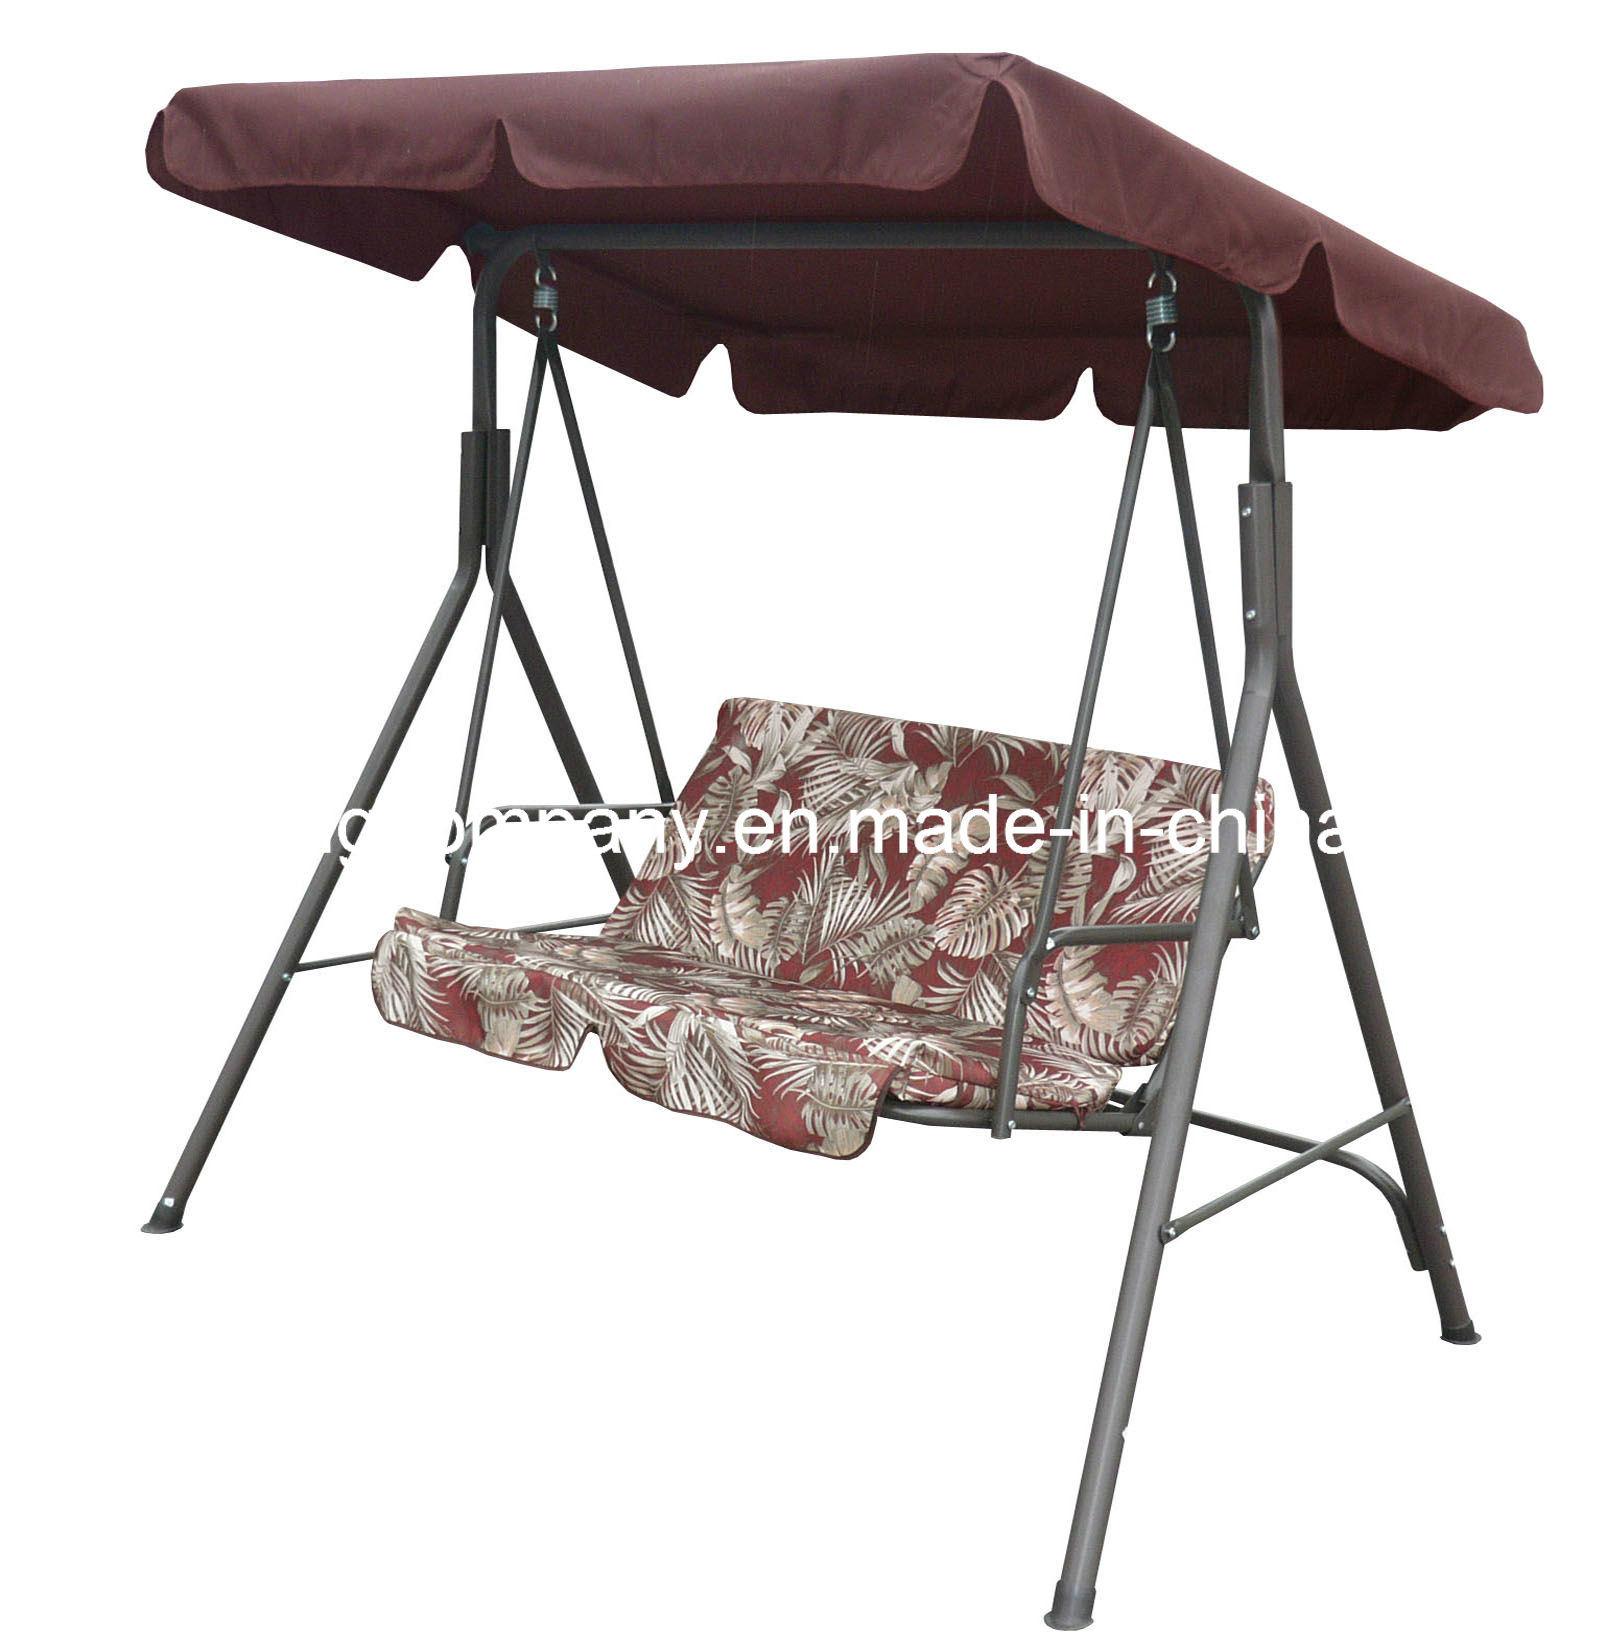 2 Seater Garden Swing Chair